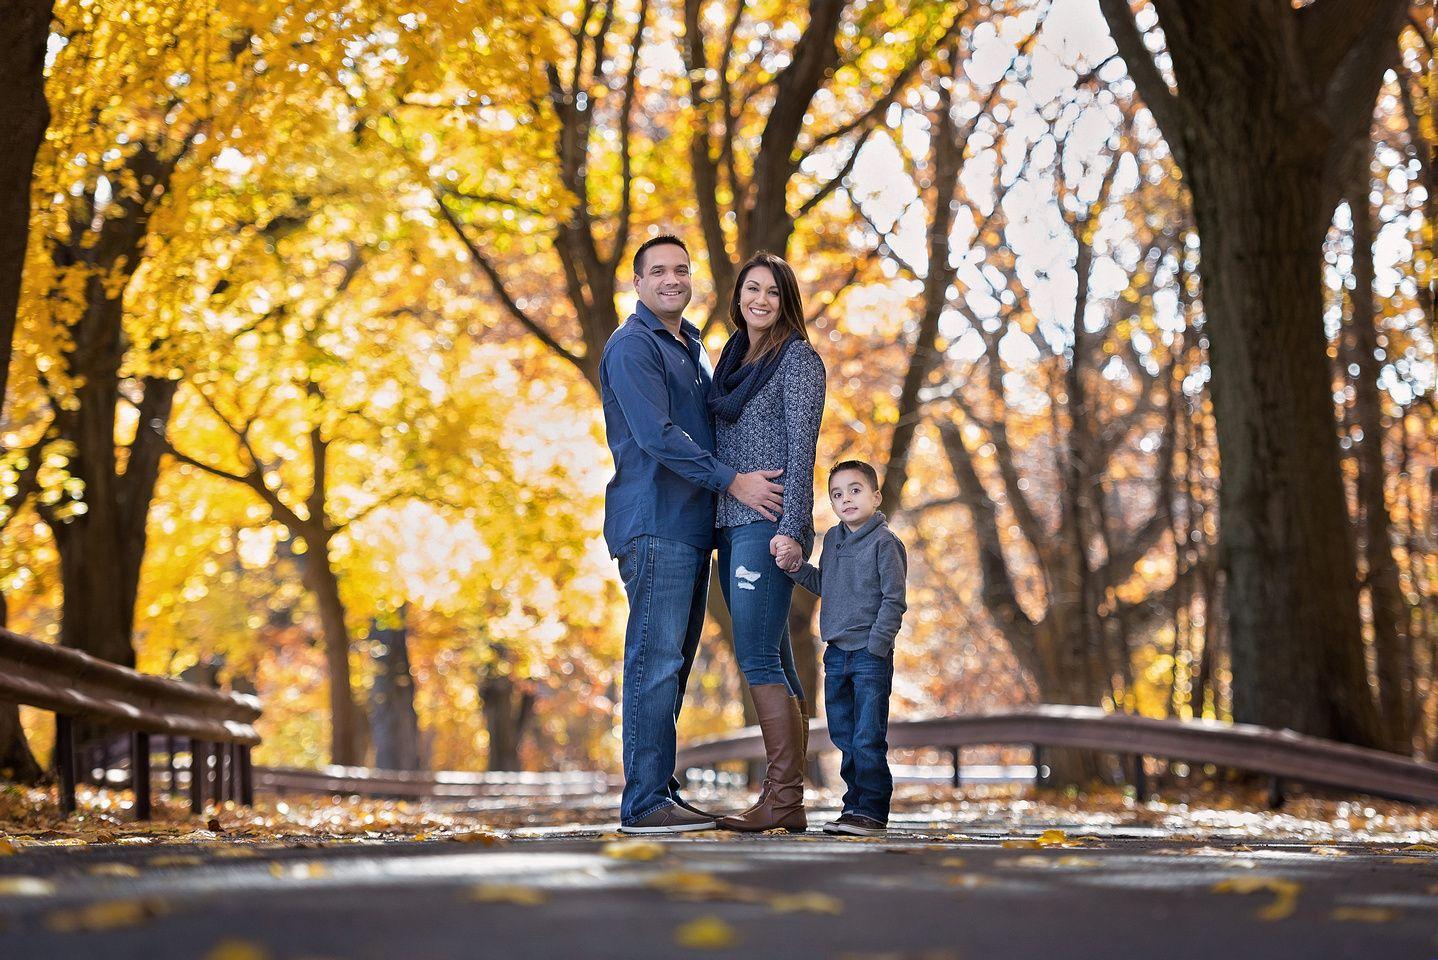 LAIACONA FALL FAMILY SESSION | THERESA MARIE PHOTOGRAPHY